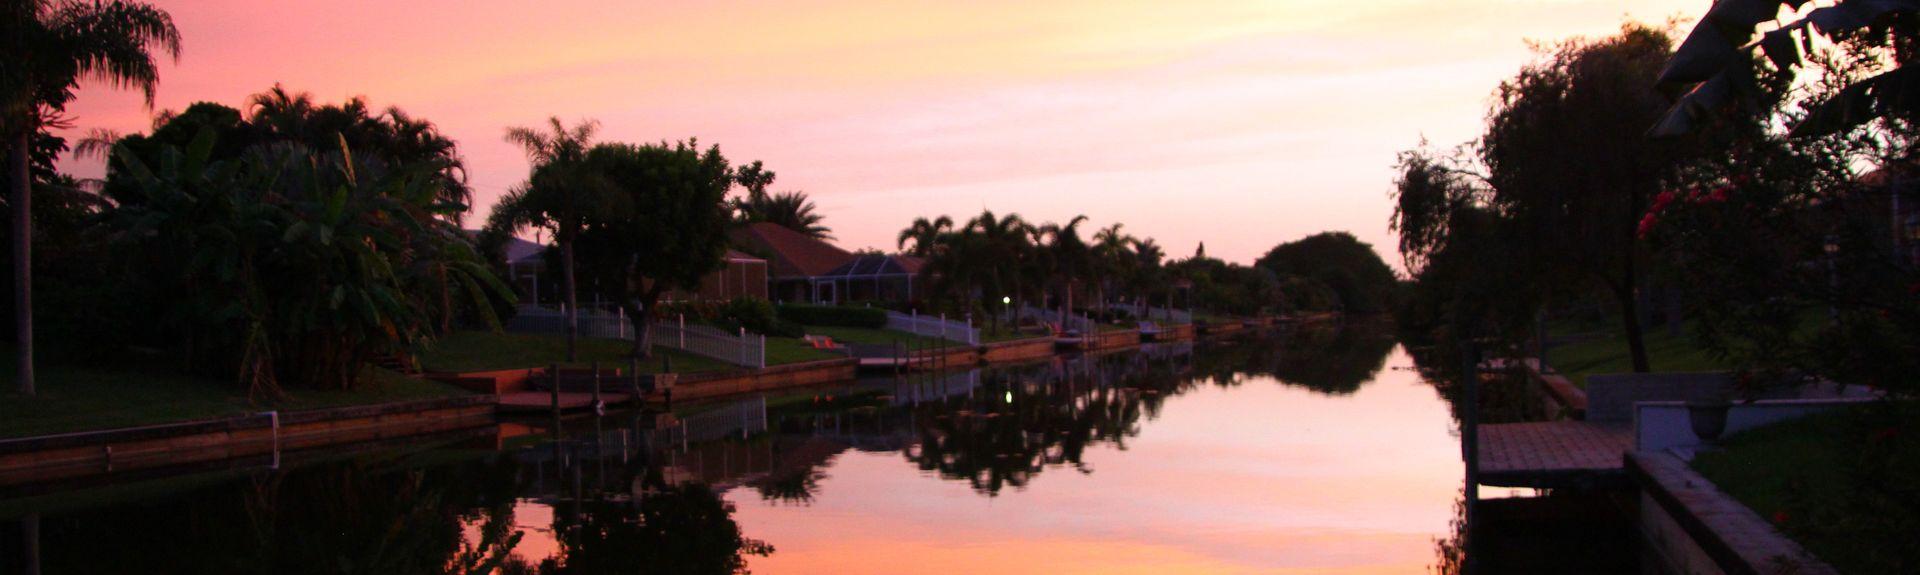 Three Palms Speedway, Punta Gorda, Florida, United States of America